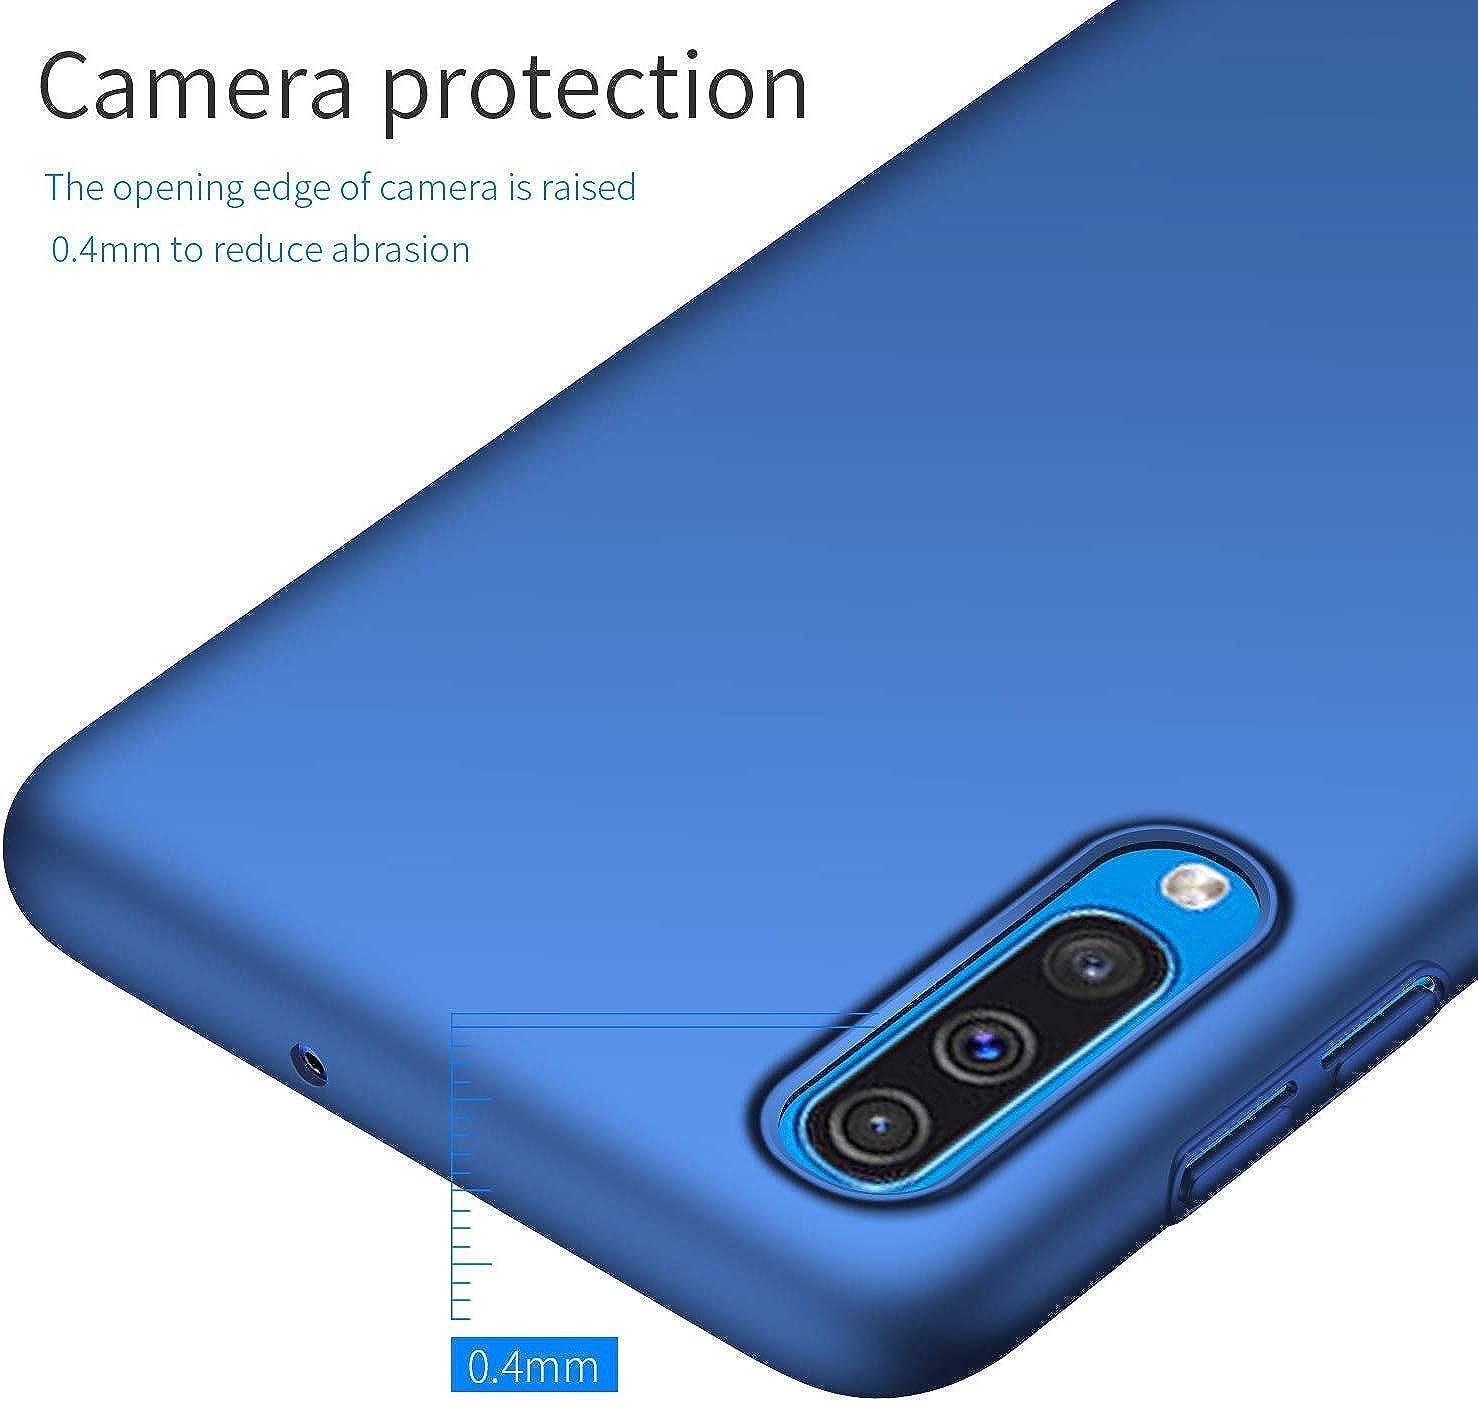 H/ülle Kompatibel mit Samsung Galaxy A50 H/ülle Harte Schale Schutzh/ülle Ultrad/ünn Anti-Fall Handyh/ülle rutschfest PC Plastic Case Interessant kratzfesten Bunt Cover F/ür Samsung Galaxy A50